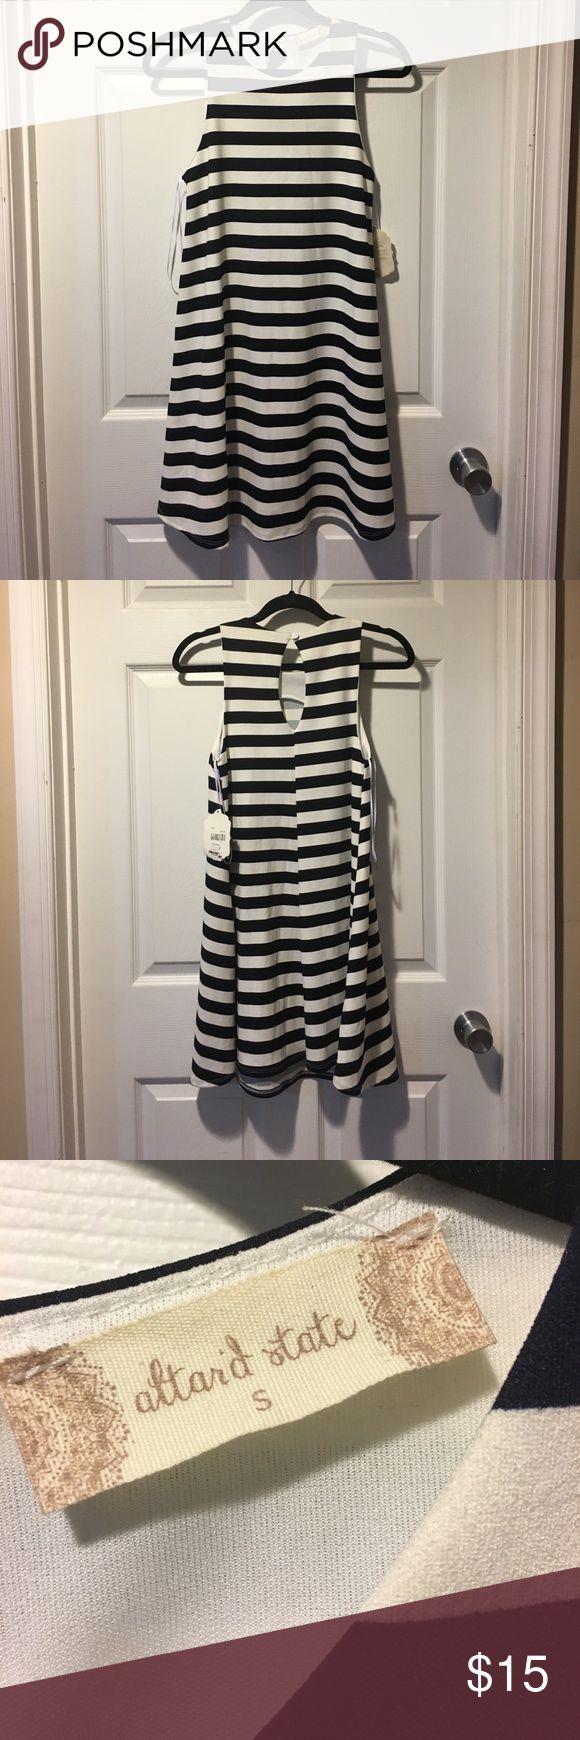 Altar'd State striped mini dress Blue and white striped mini dress. Size small Altar'd State Dresses Mini